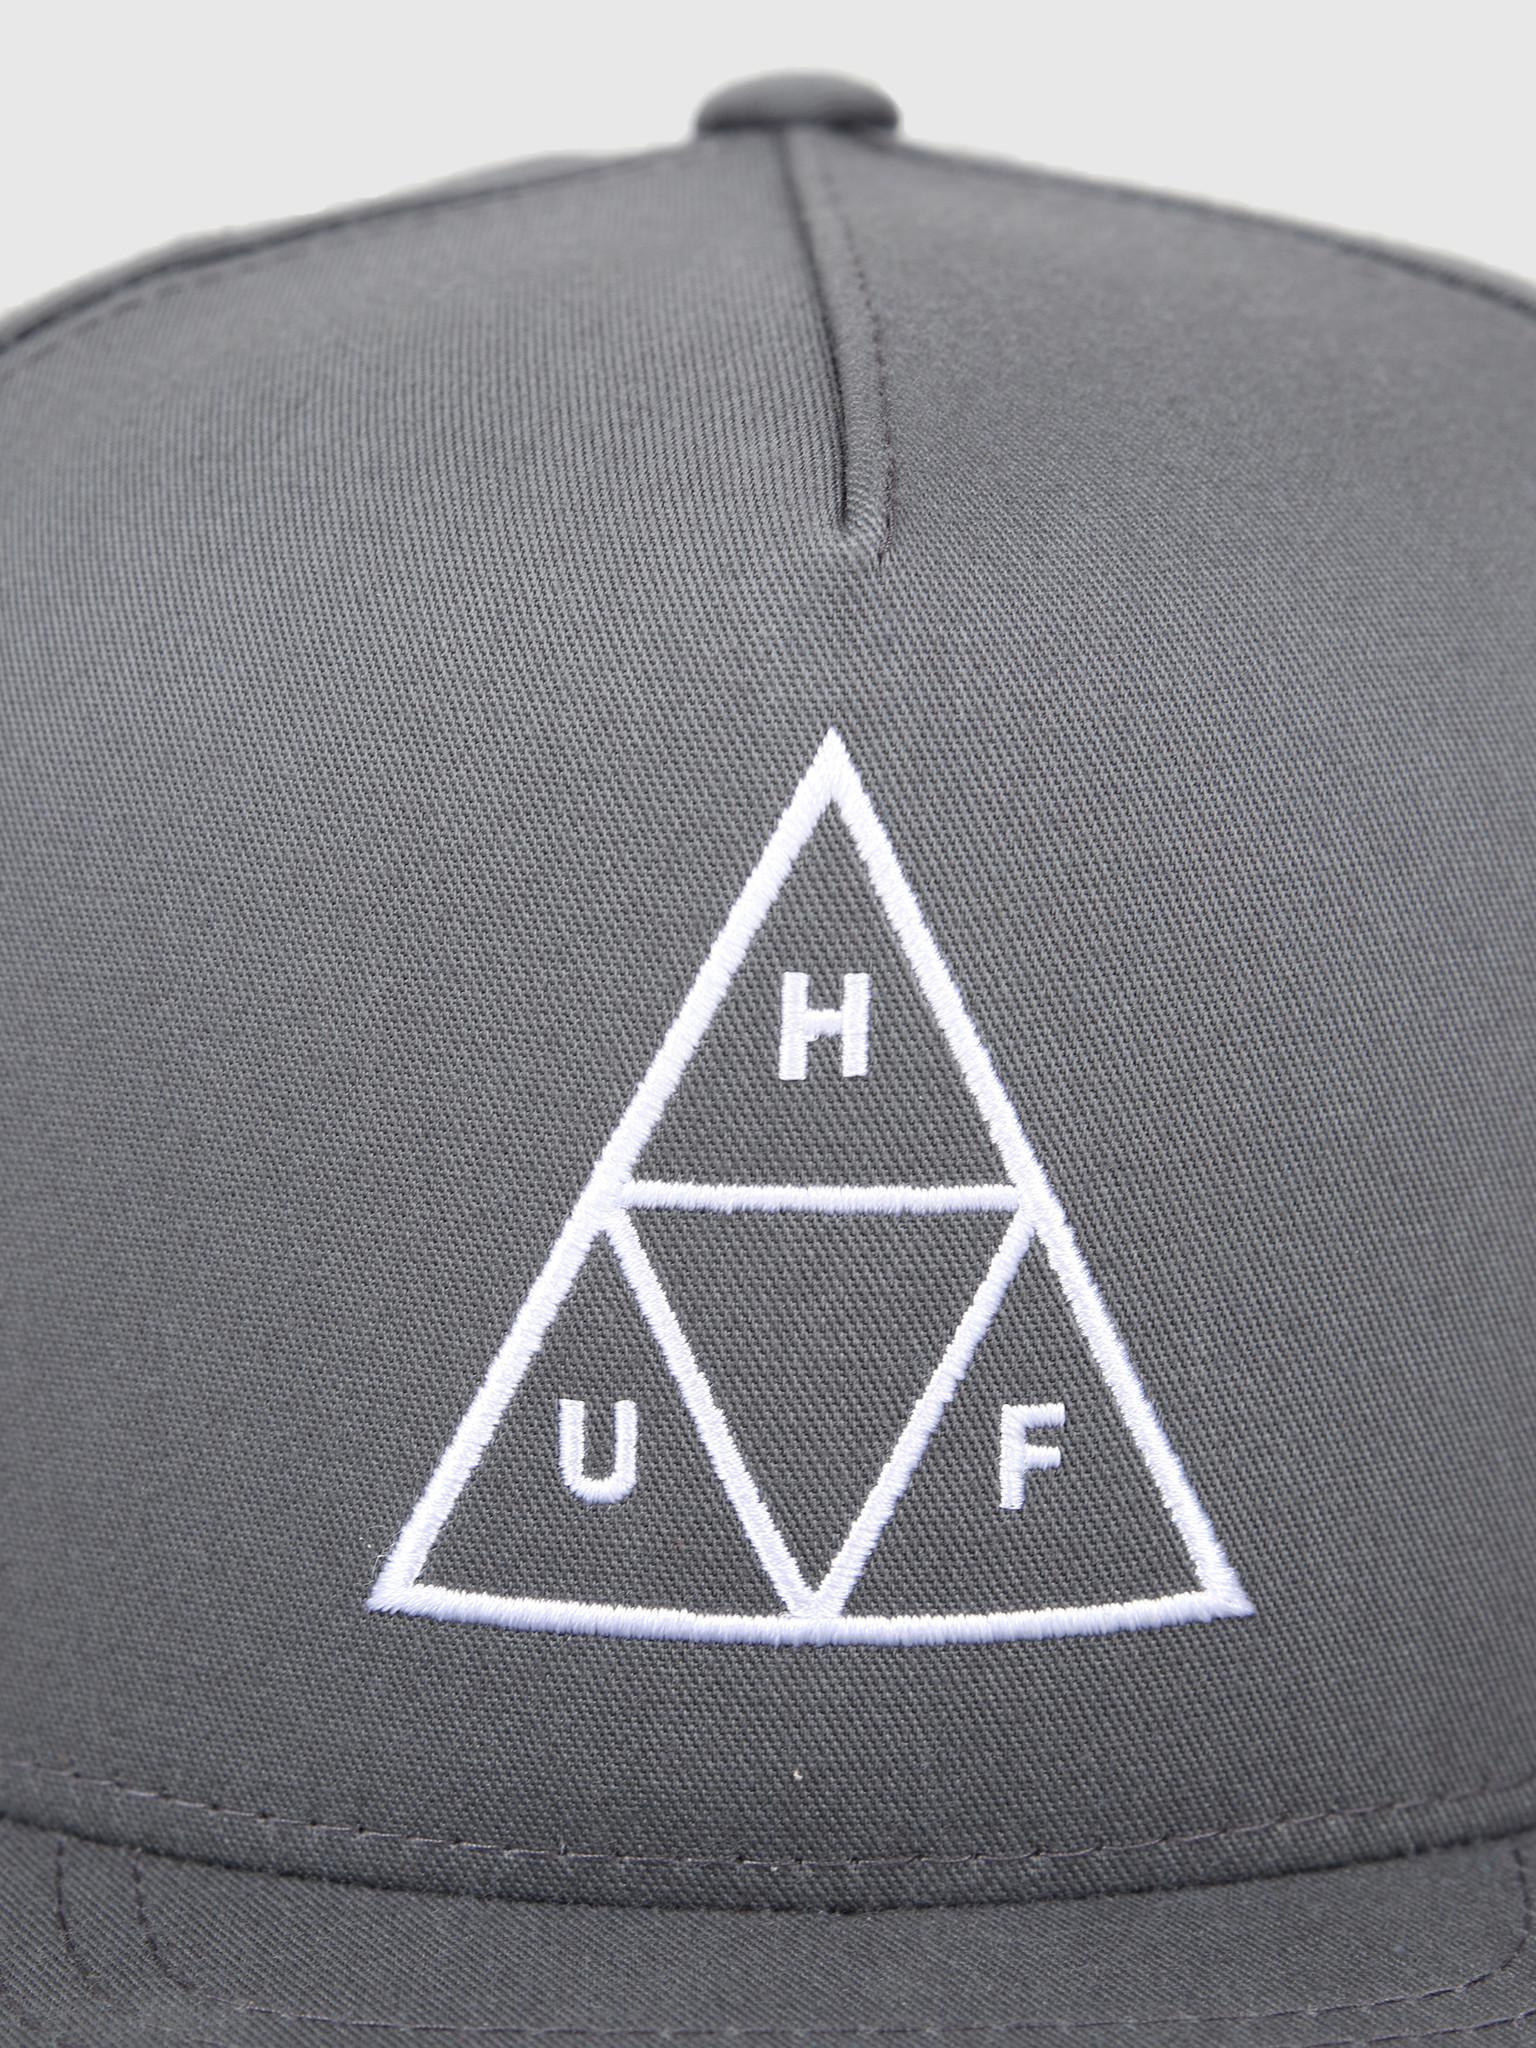 HUF HUF Essentials TT Snapback Hat Charcoal HT00344-Charc